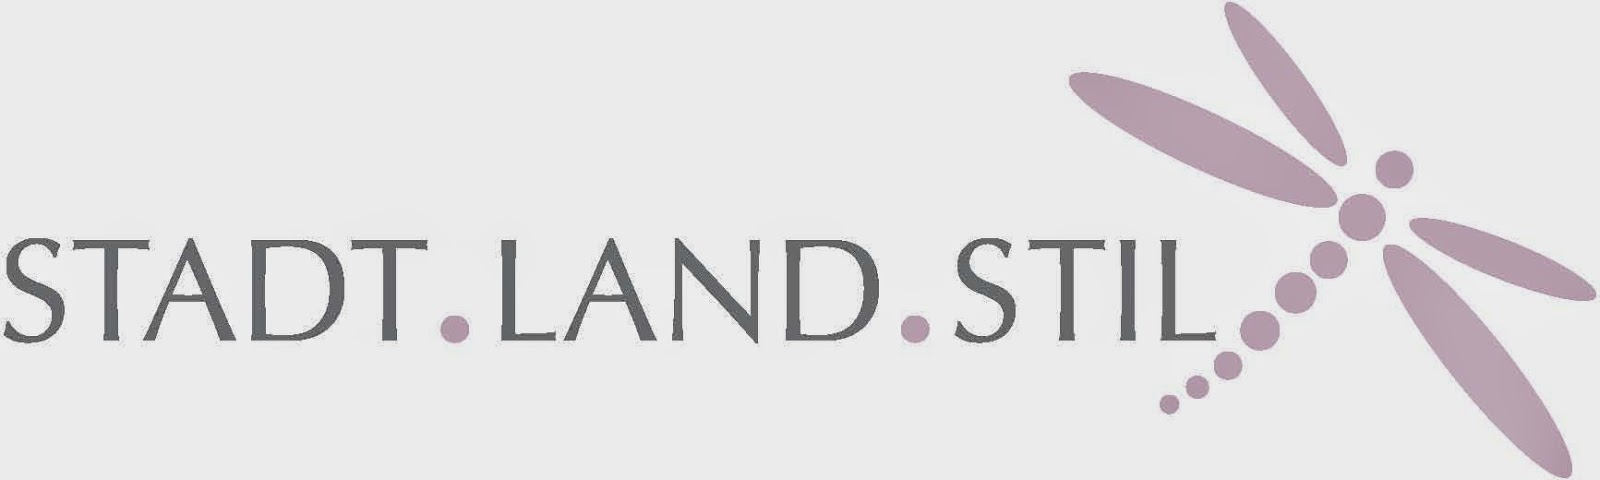 http://www.stadtlandstil.de/